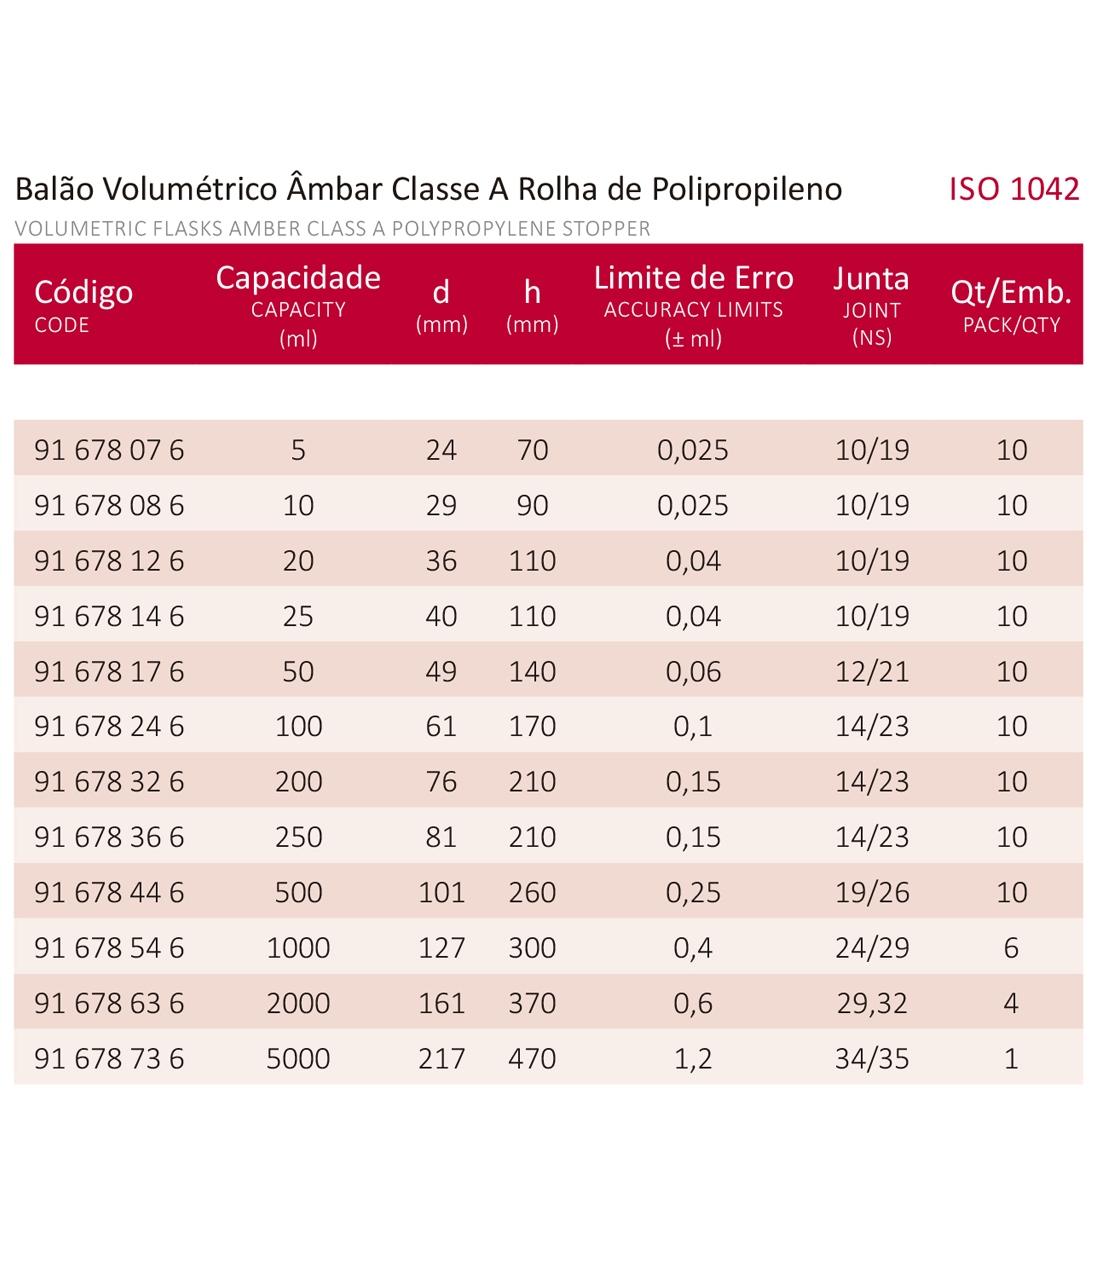 BALÃO VOLUMÉTRICO CLASSE A ROLHA POLI ÂMBAR C/ CERTIFICADO RBC 15 ML - Marca Laborglas - Cód. 91678116-R